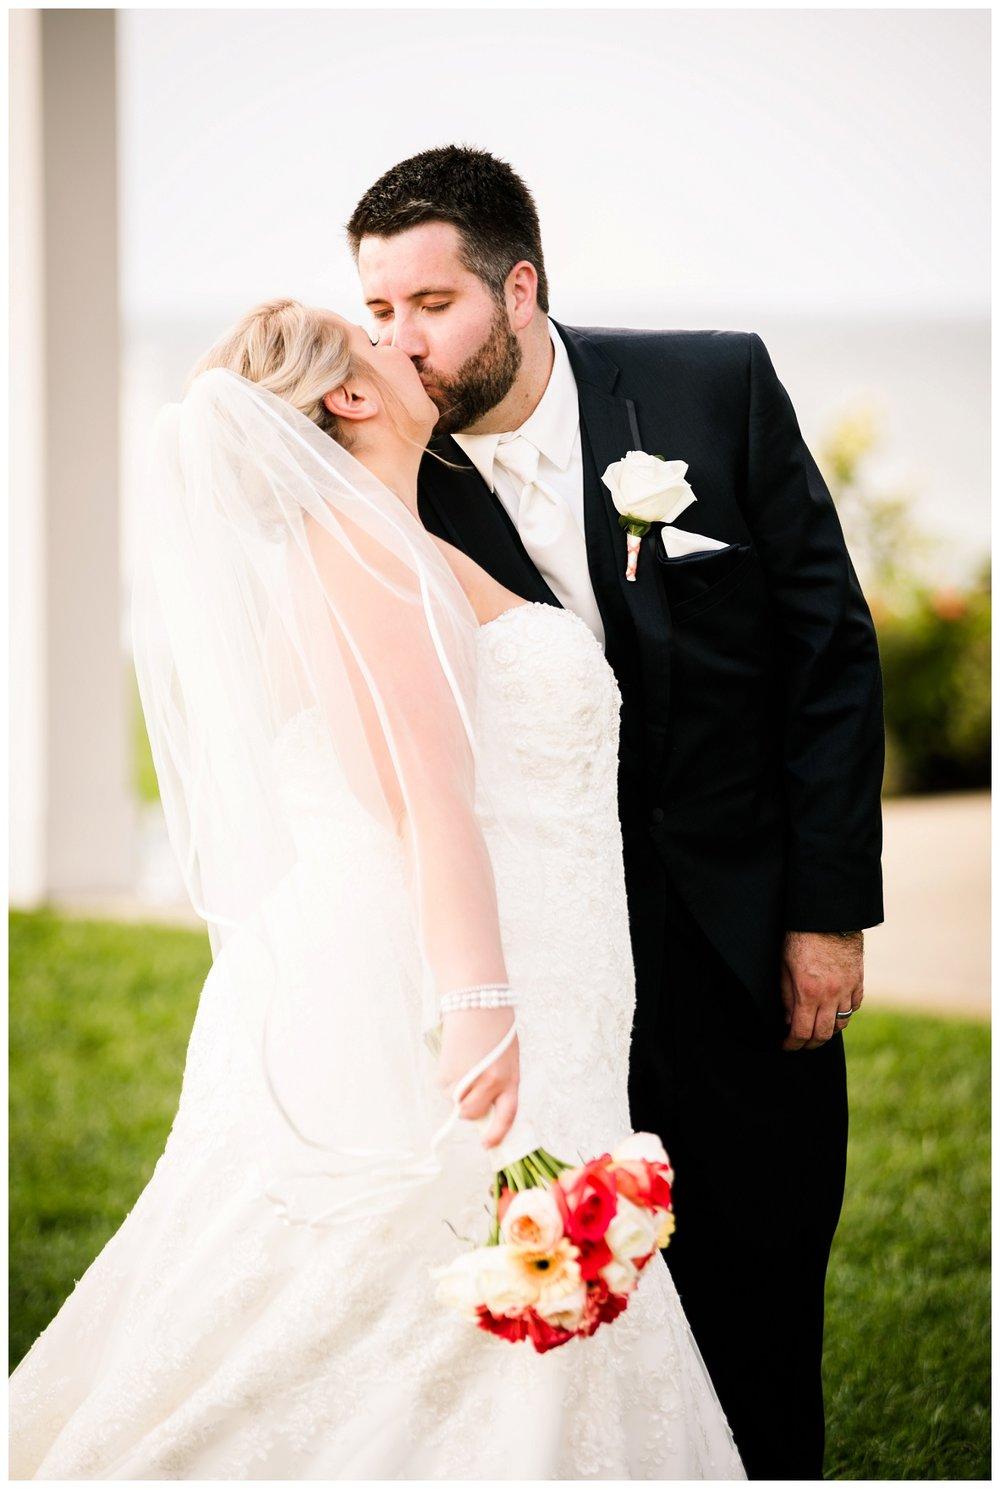 Mr. and Mrs. Kramp_0042m.jpg